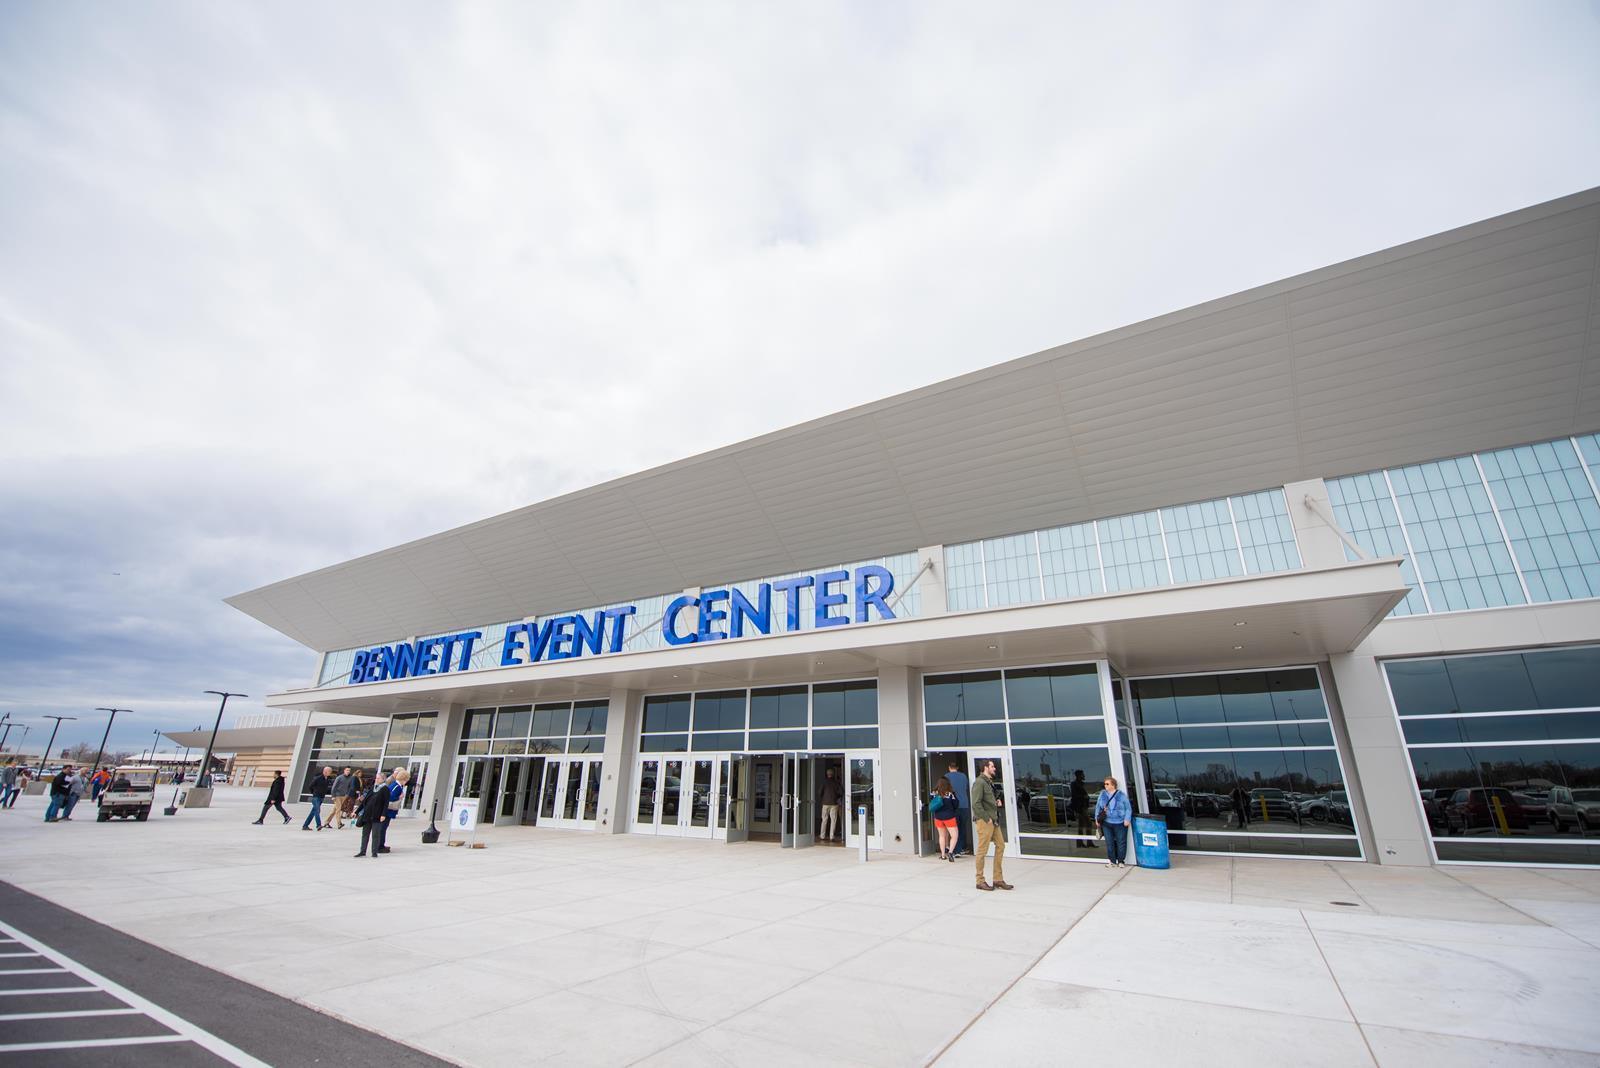 Bennett Event Center